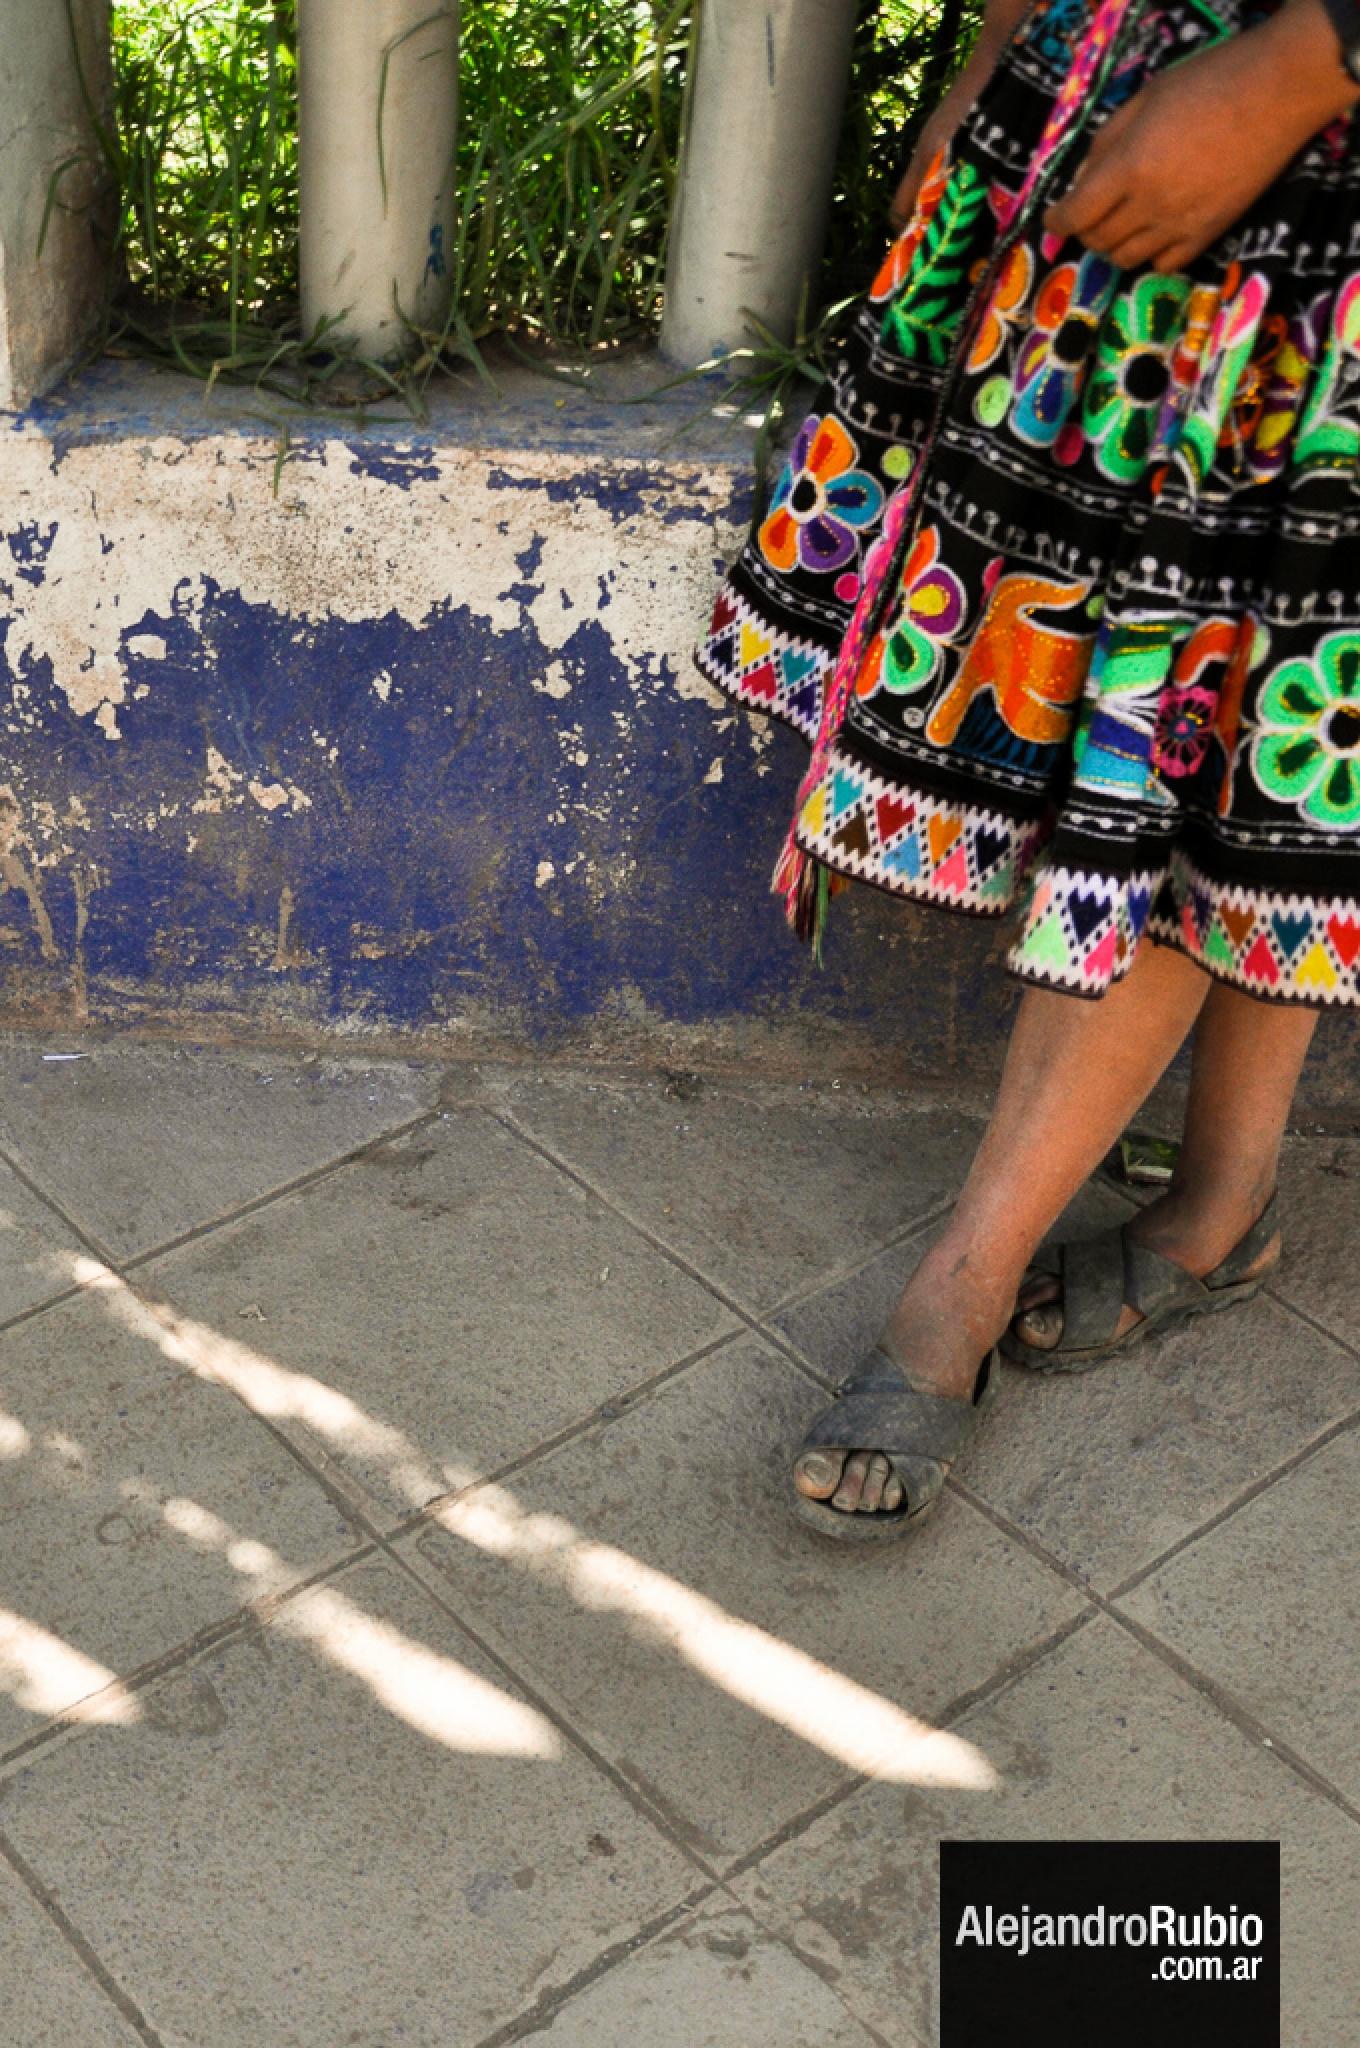 Foots by Ale Rubio